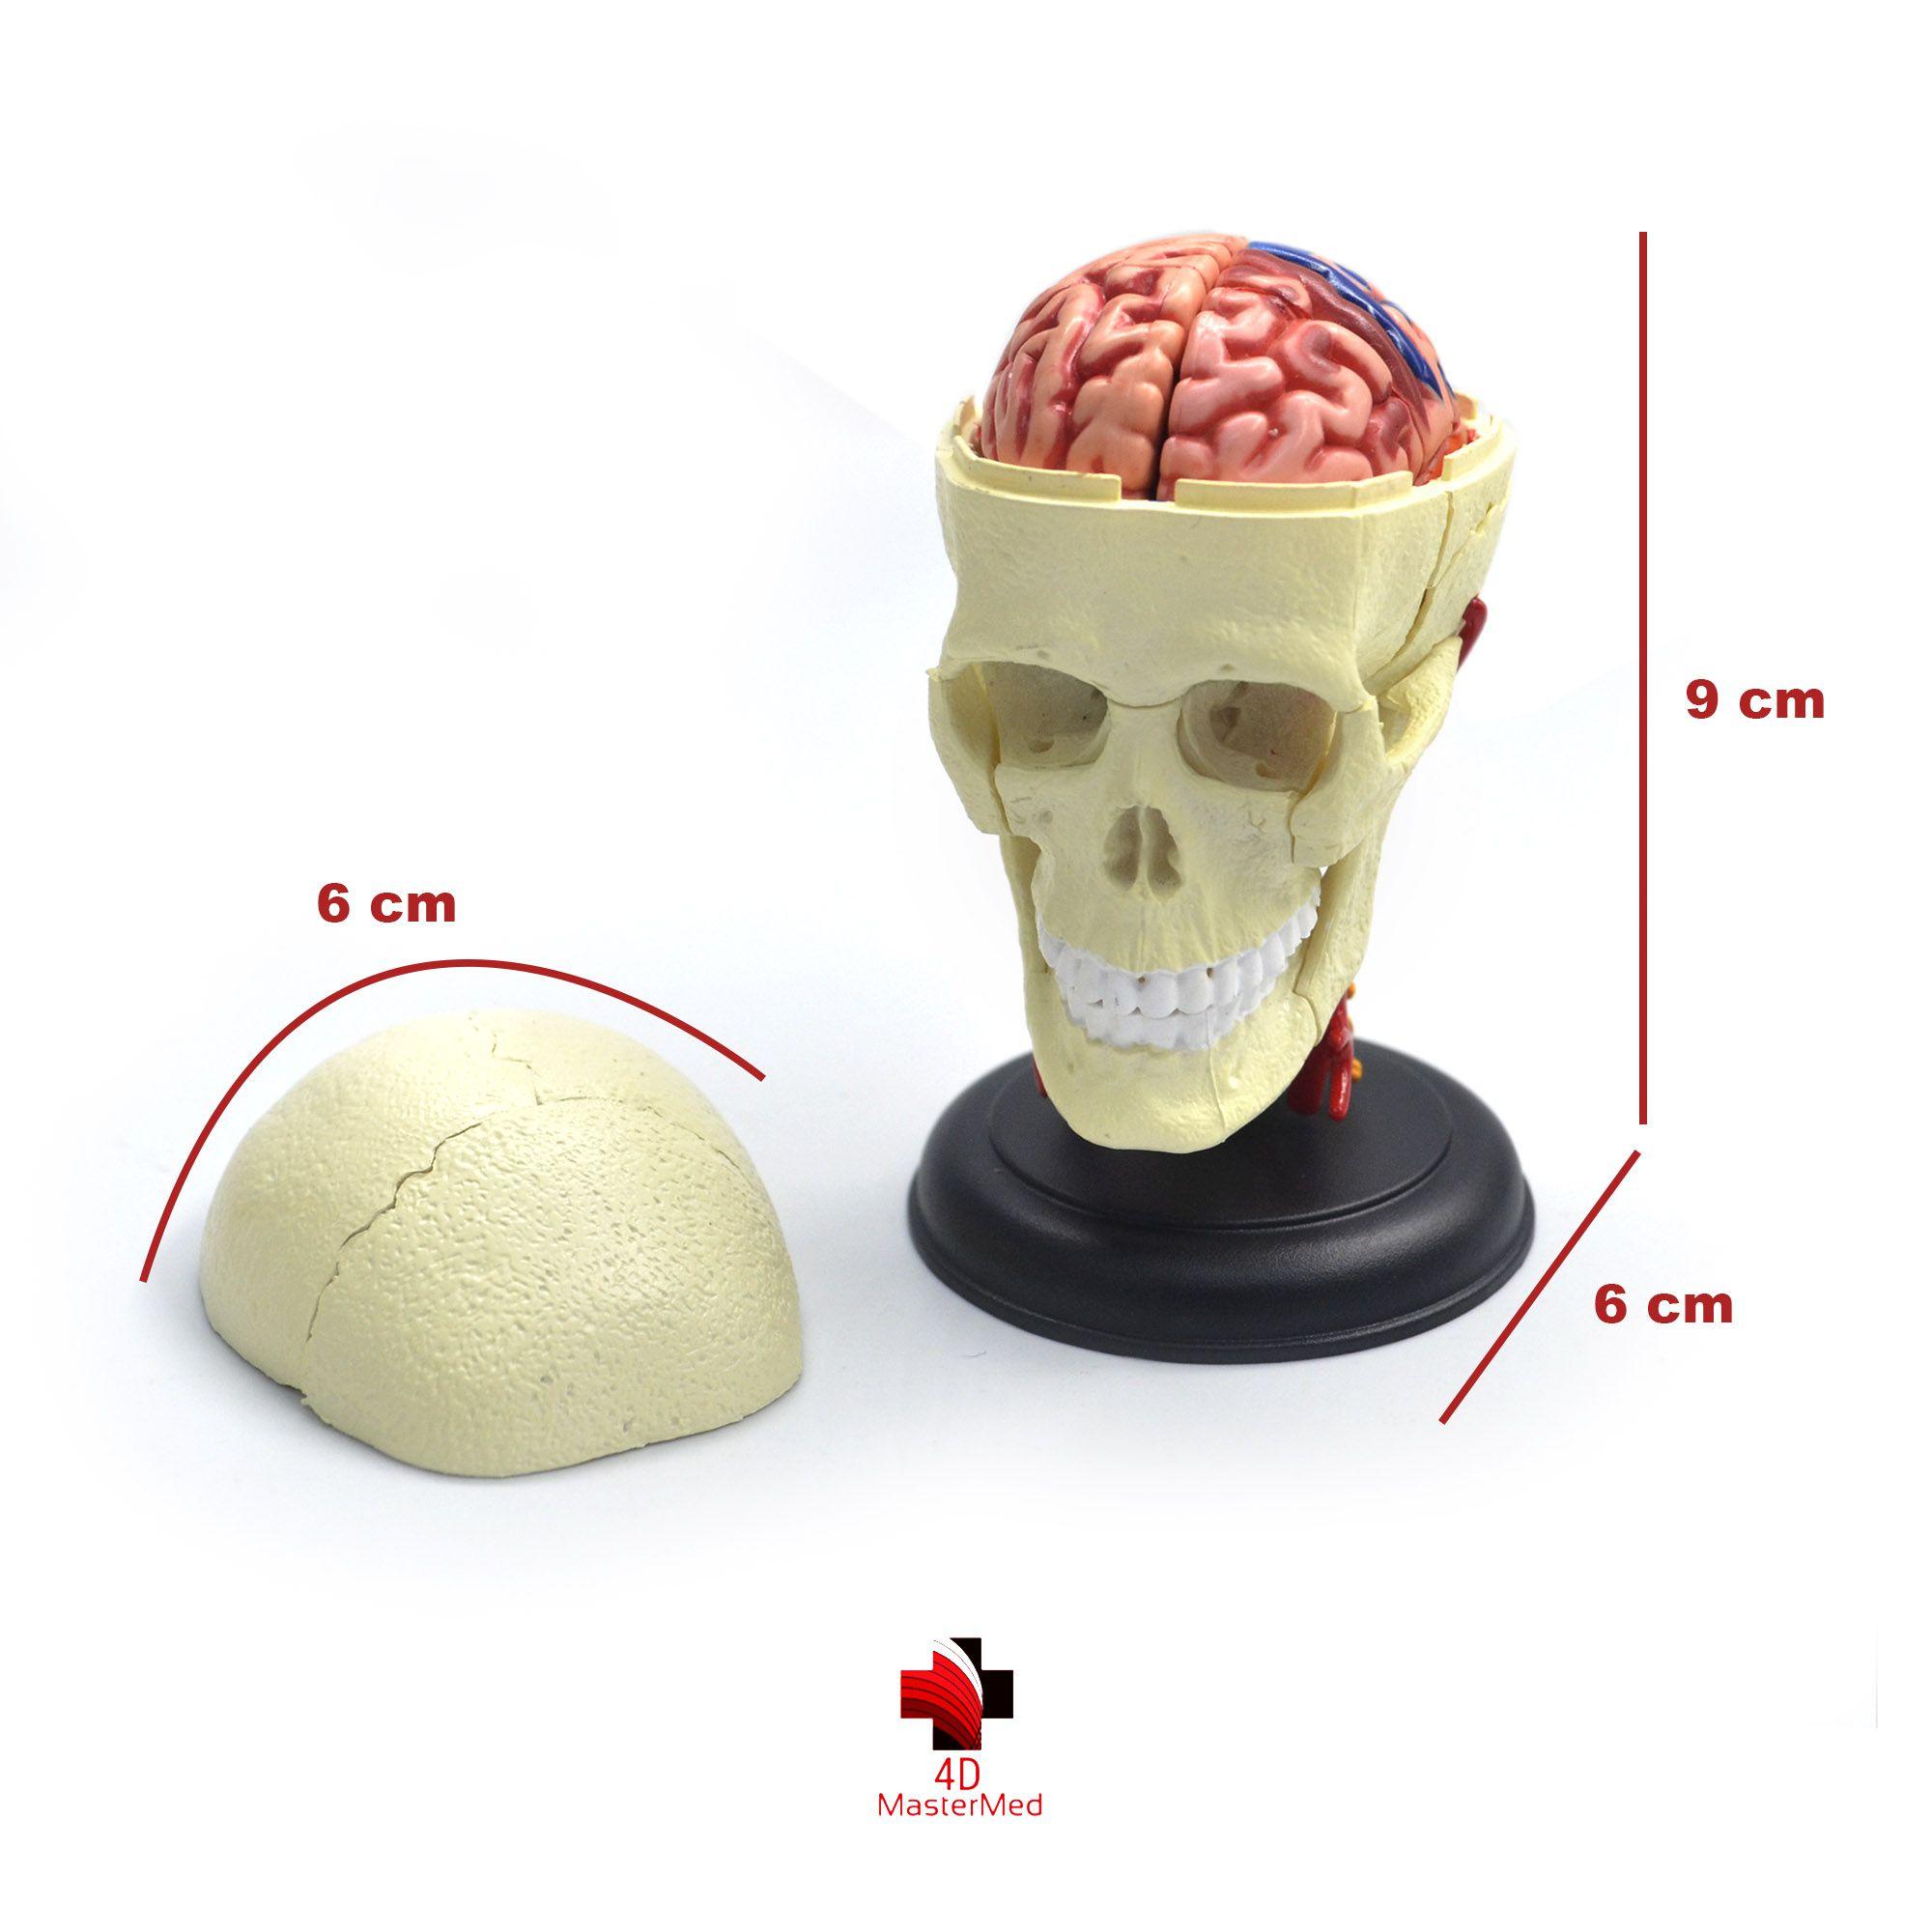 Kit anatomia humana - Crânio e Nervos, Cérebro e Cabeça